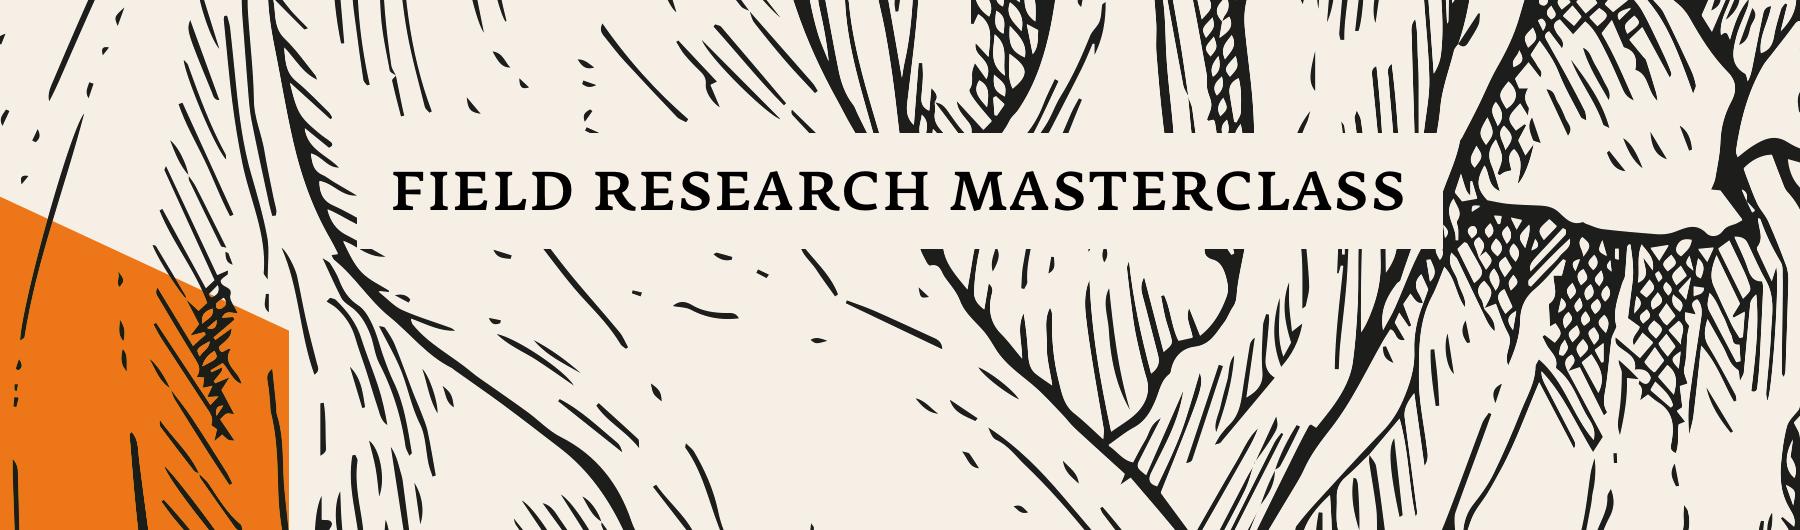 Jan Chipchase - Field Research Masterclass, Sydney, November 30